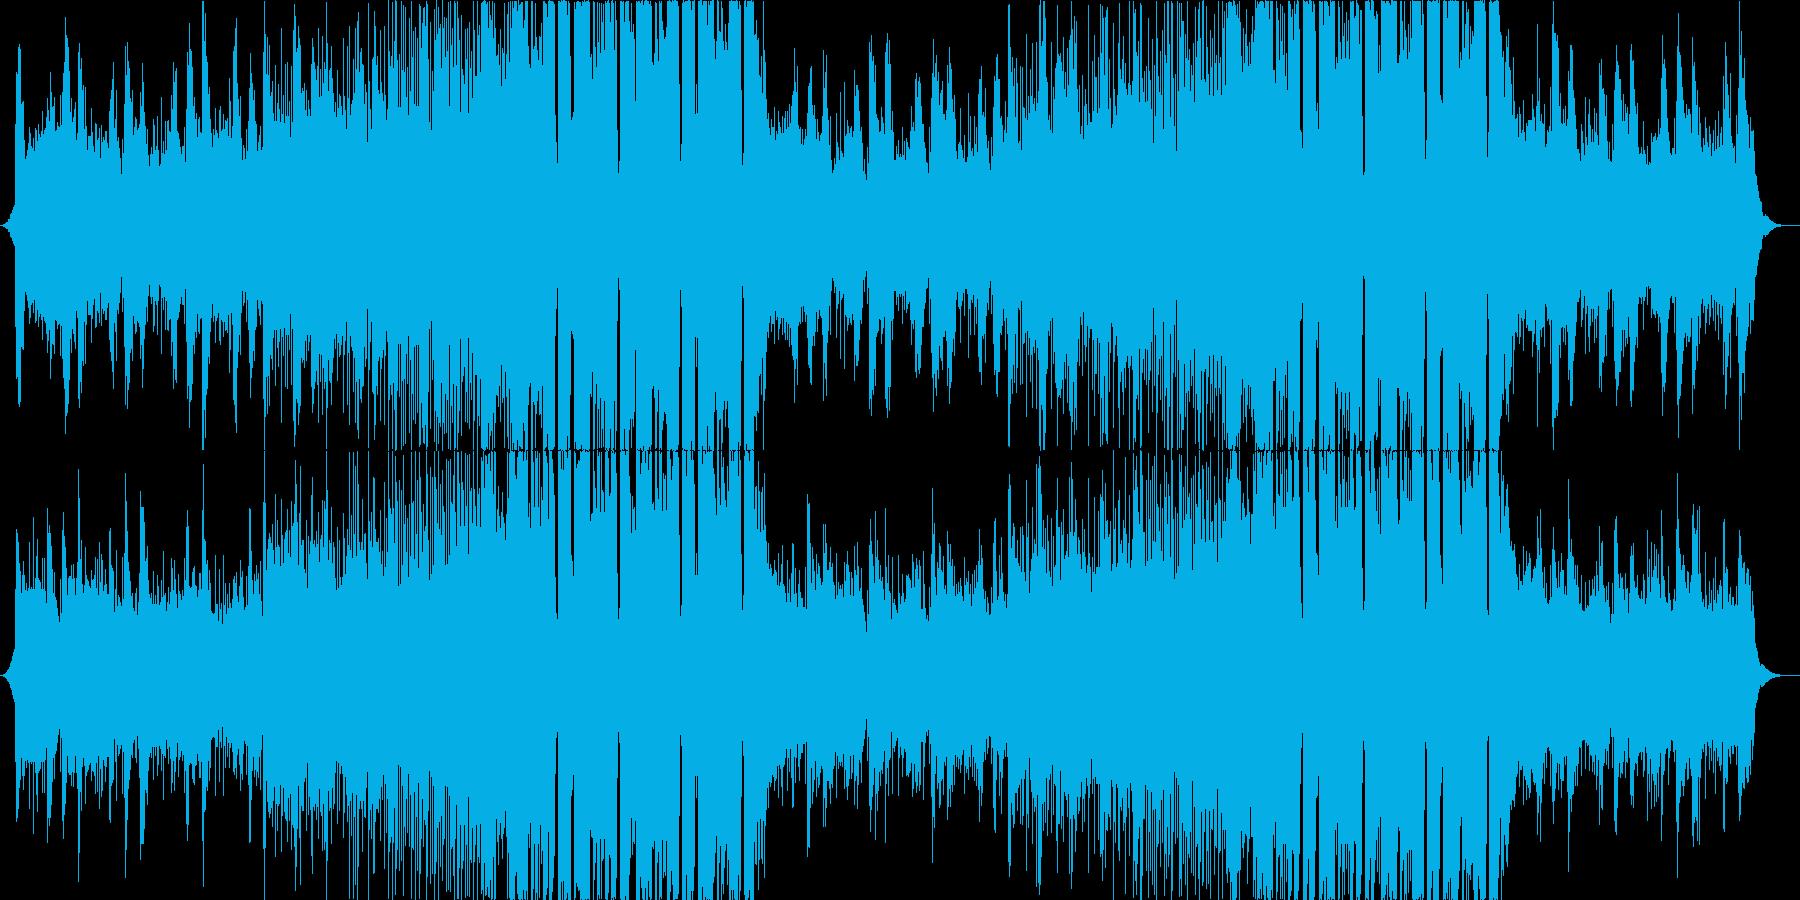 FutureBass2、洋楽、爽快、夏aの再生済みの波形